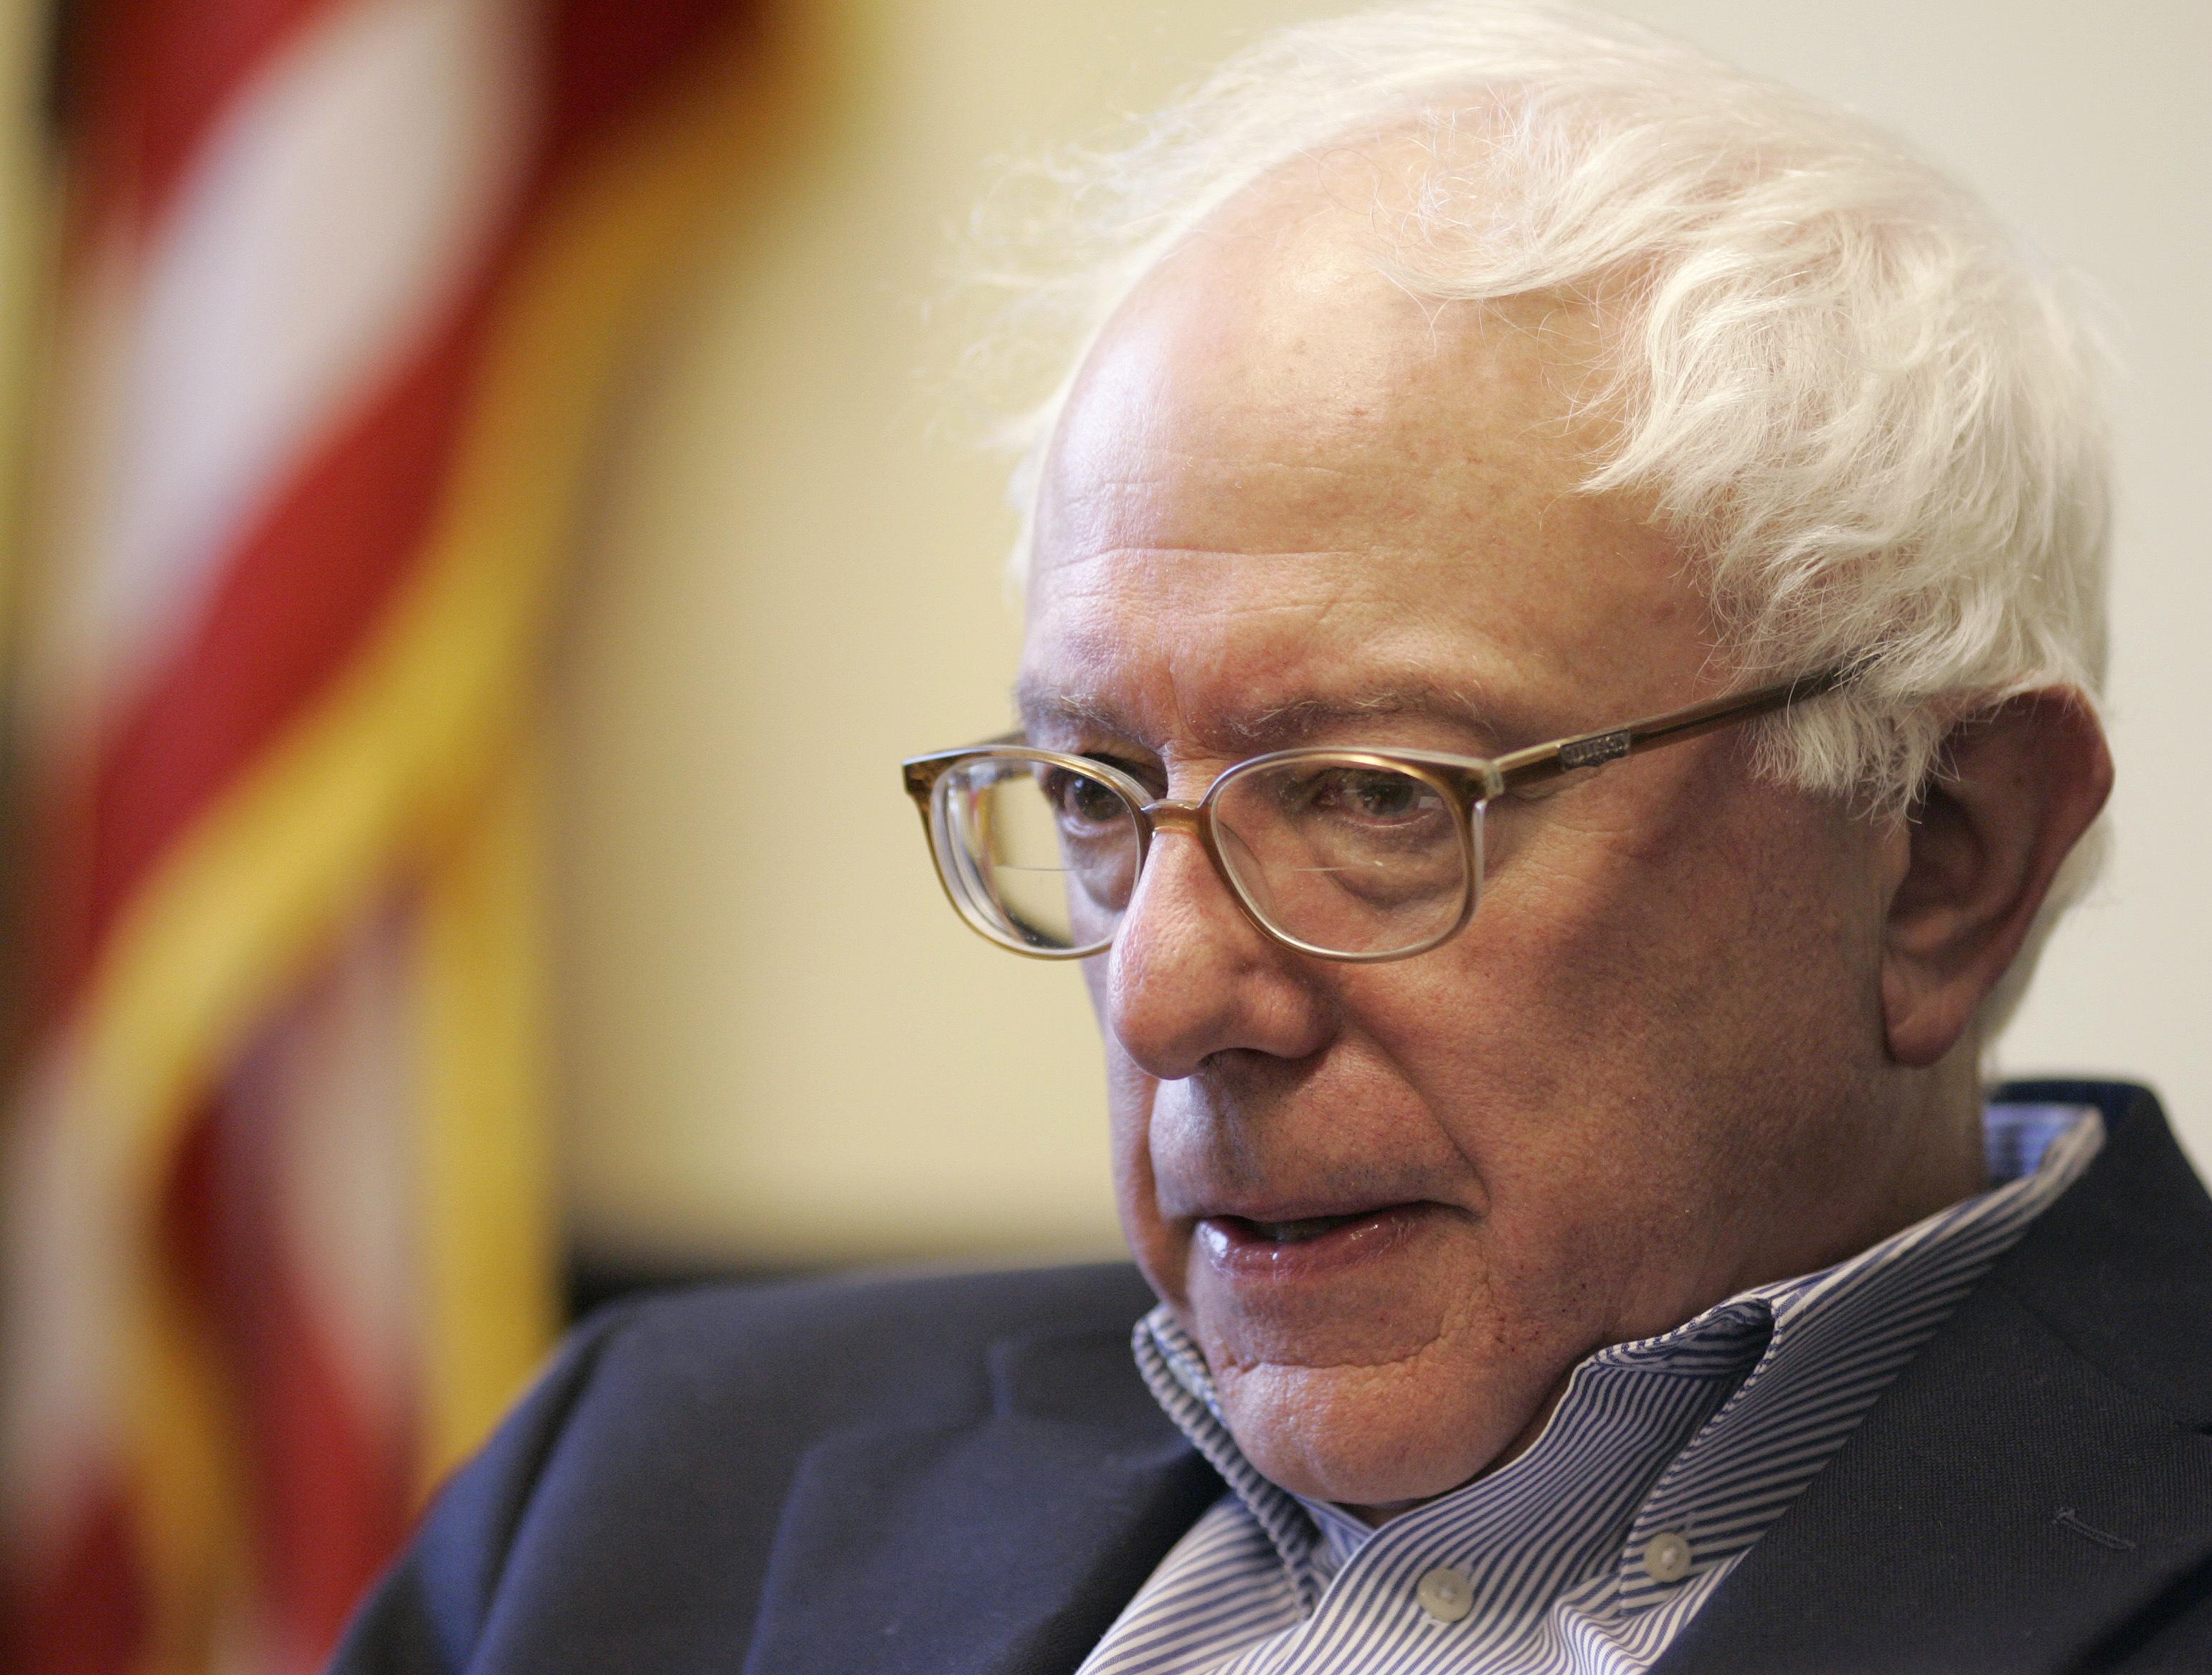 Senator-elect Bernie Sanders (I-VT) is interviewed by a Reuters reporter at Sanders' office in Burlington, Vermont November 28, 2006. (REUTERS/Brian Snyder)